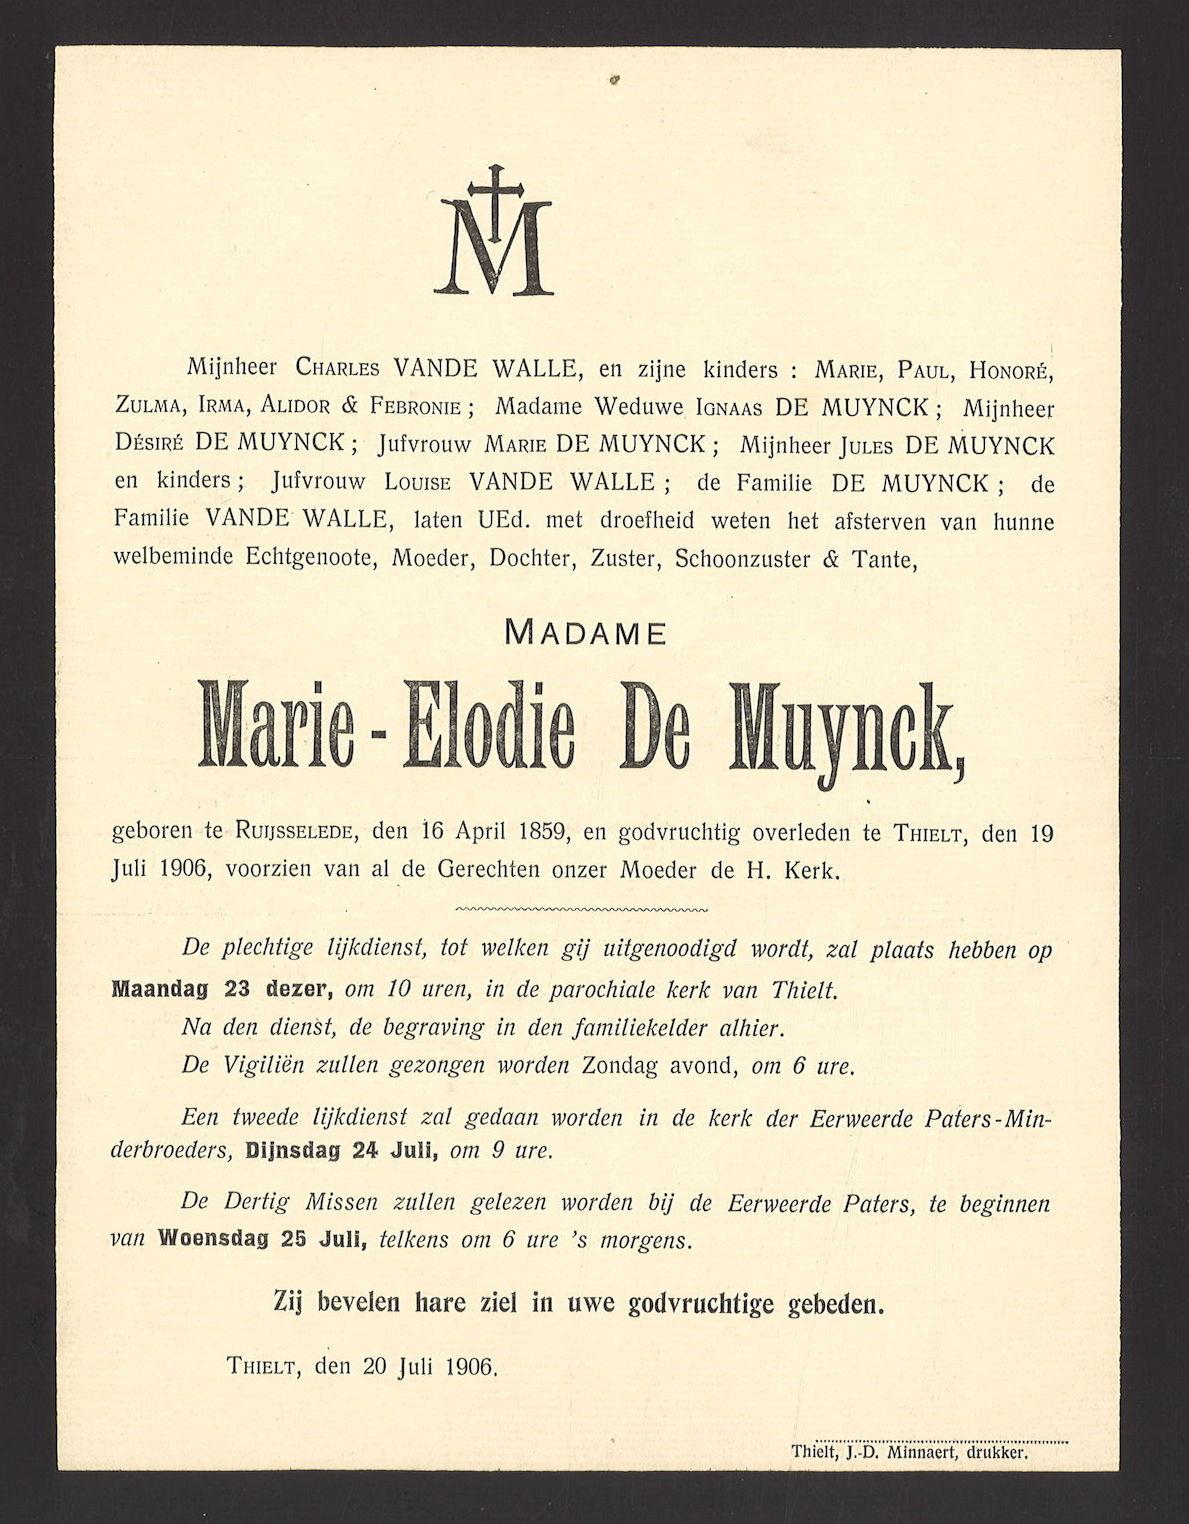 Marie-Elodie De Muynck